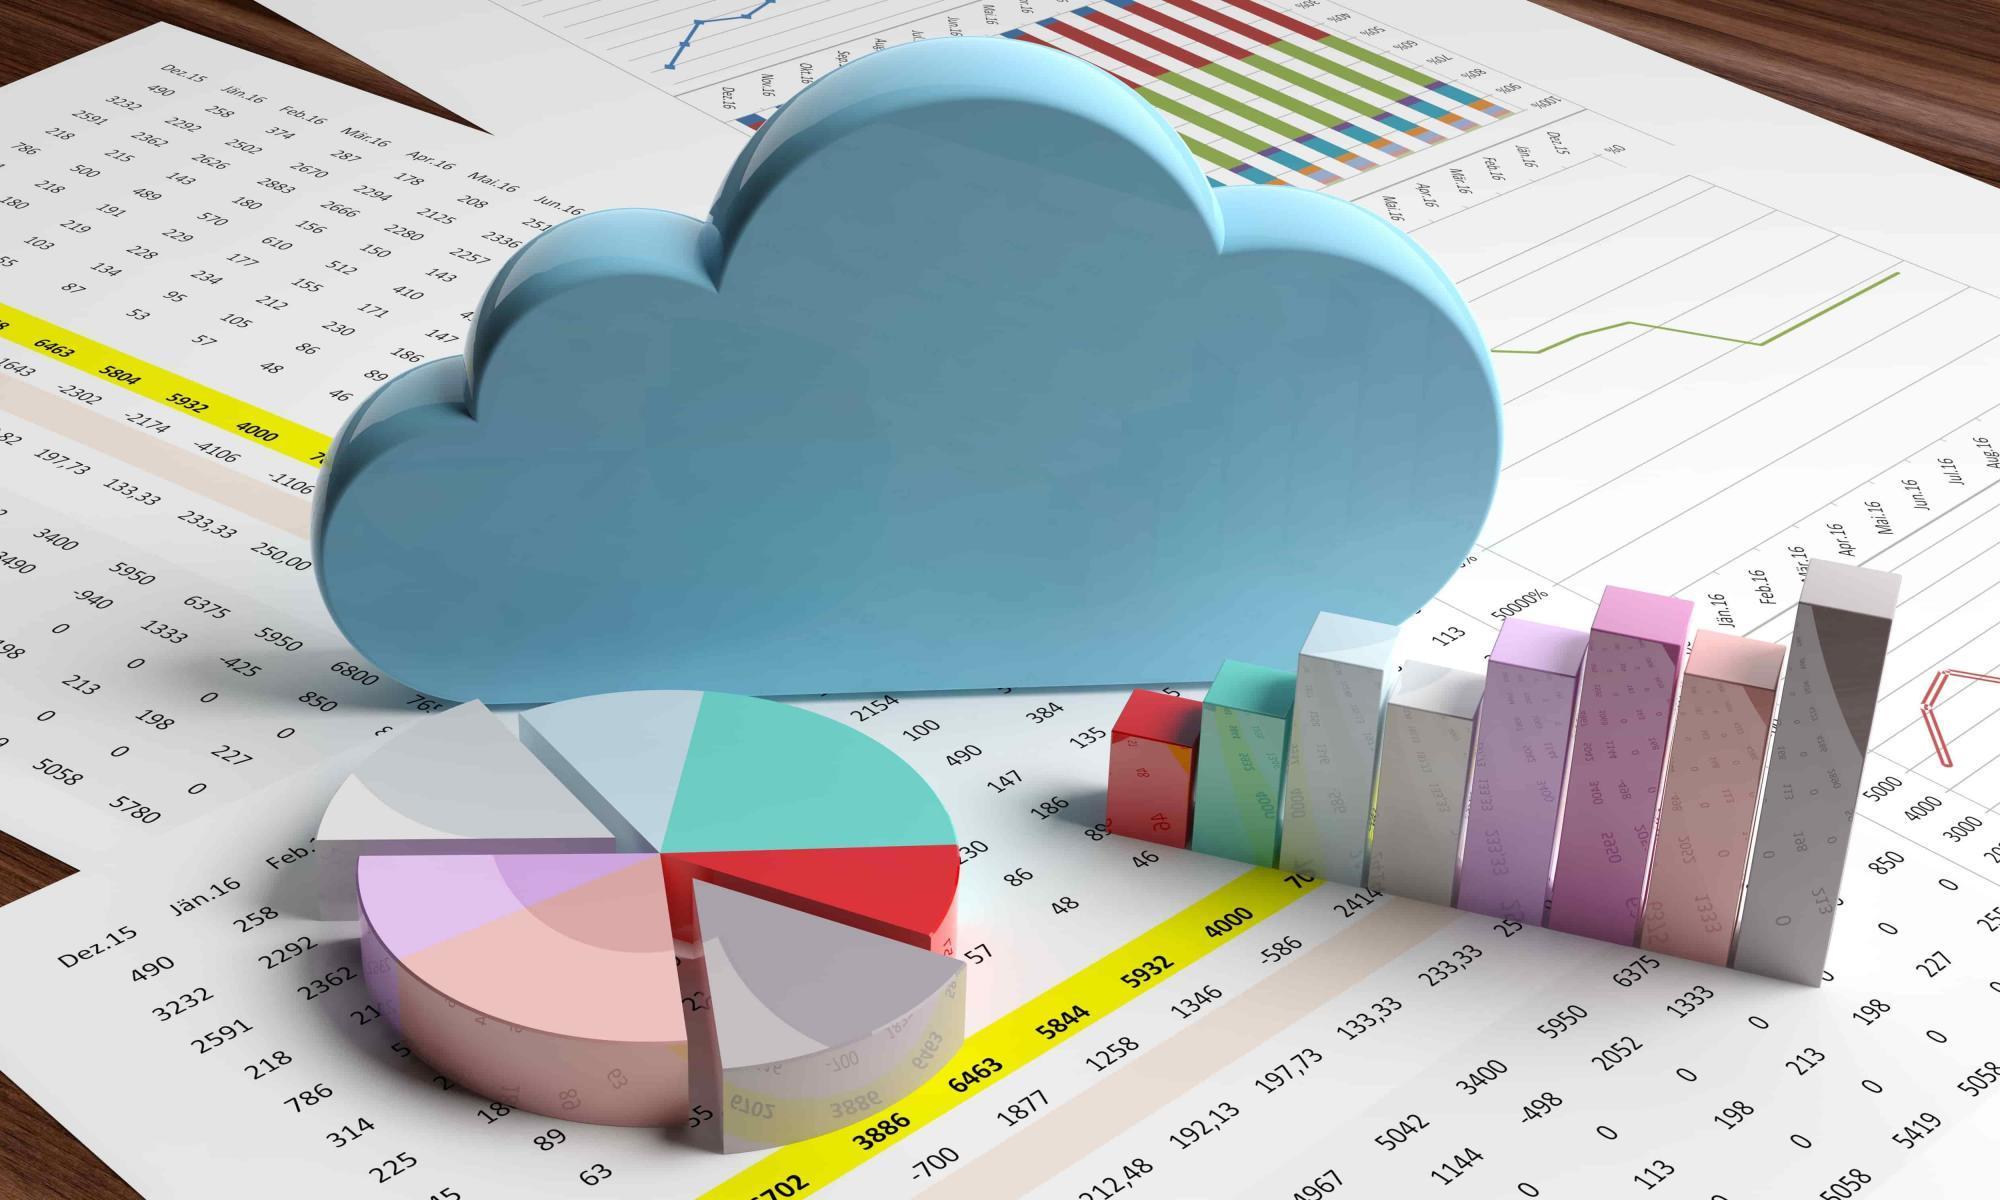 cloud-computing-stats-blue-cloud-on-data-analysis-YR3E64S-min